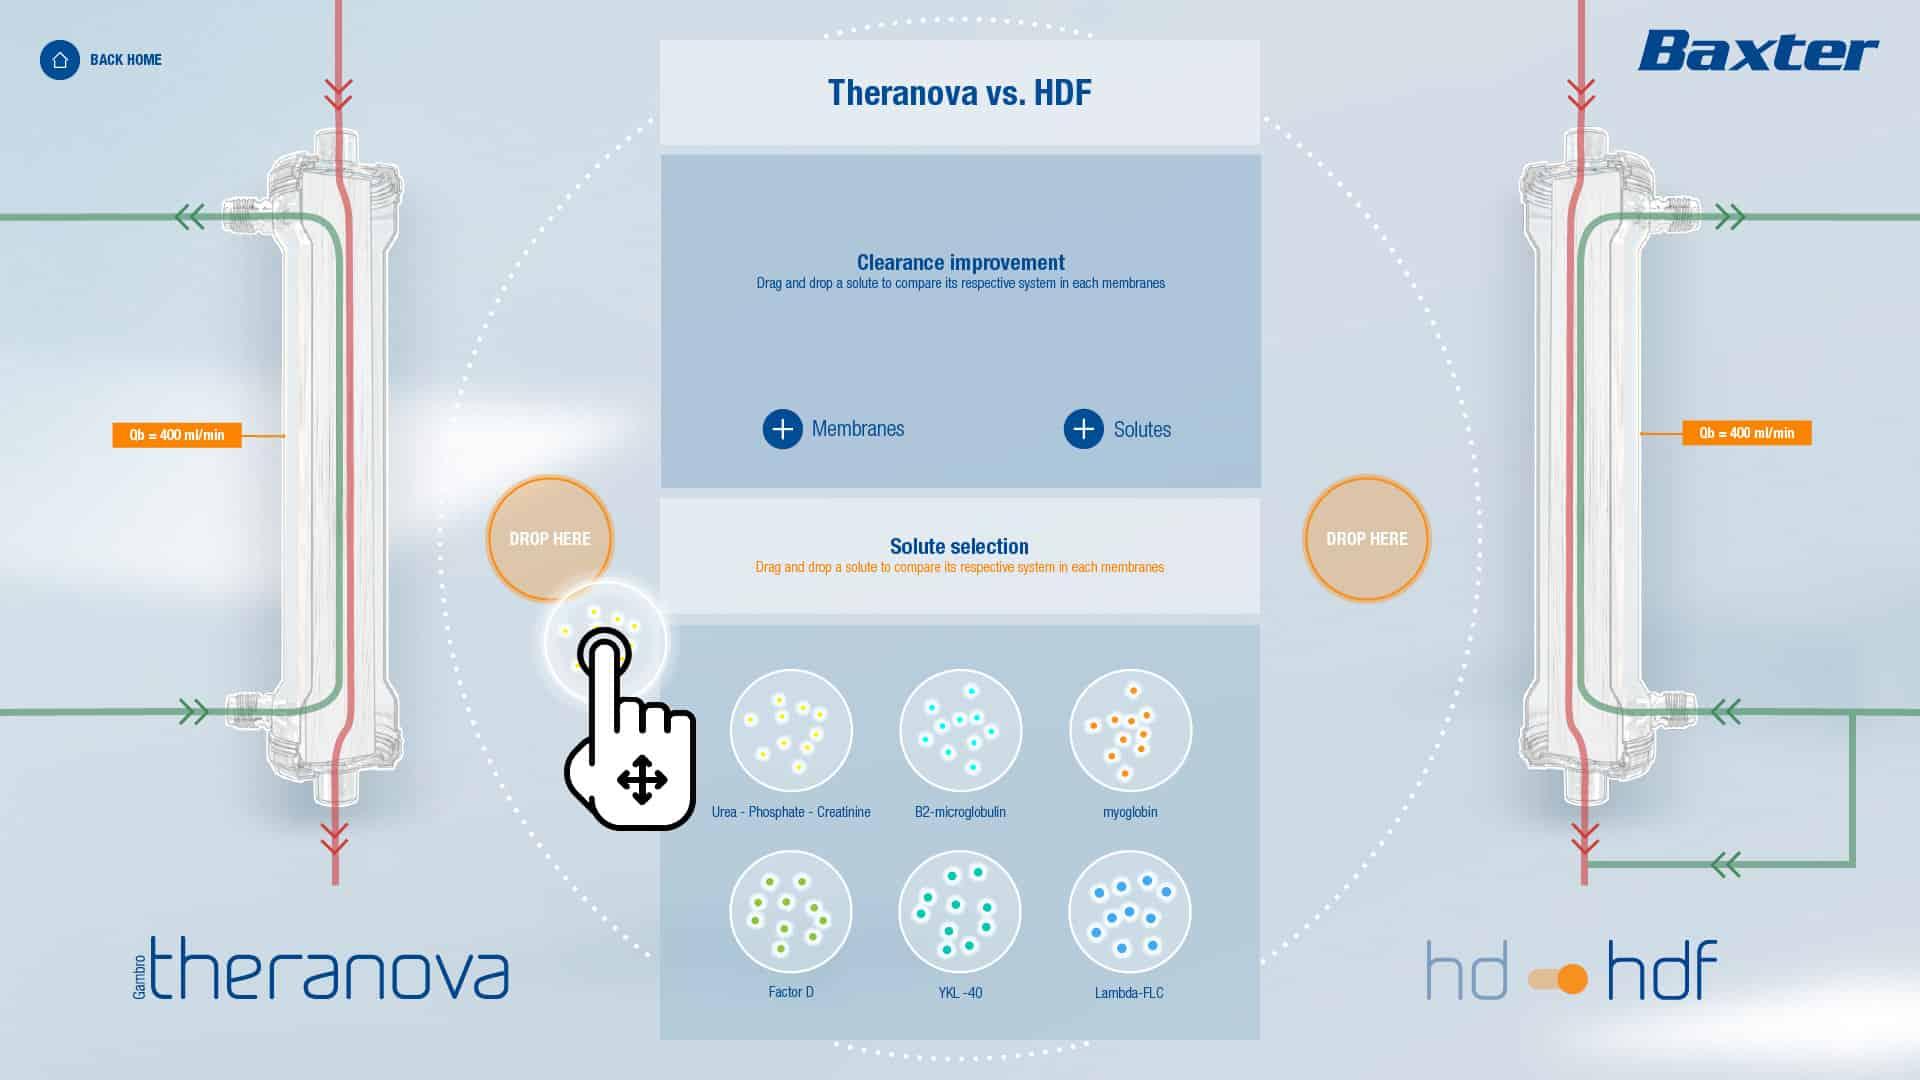 Theranova interactive wall